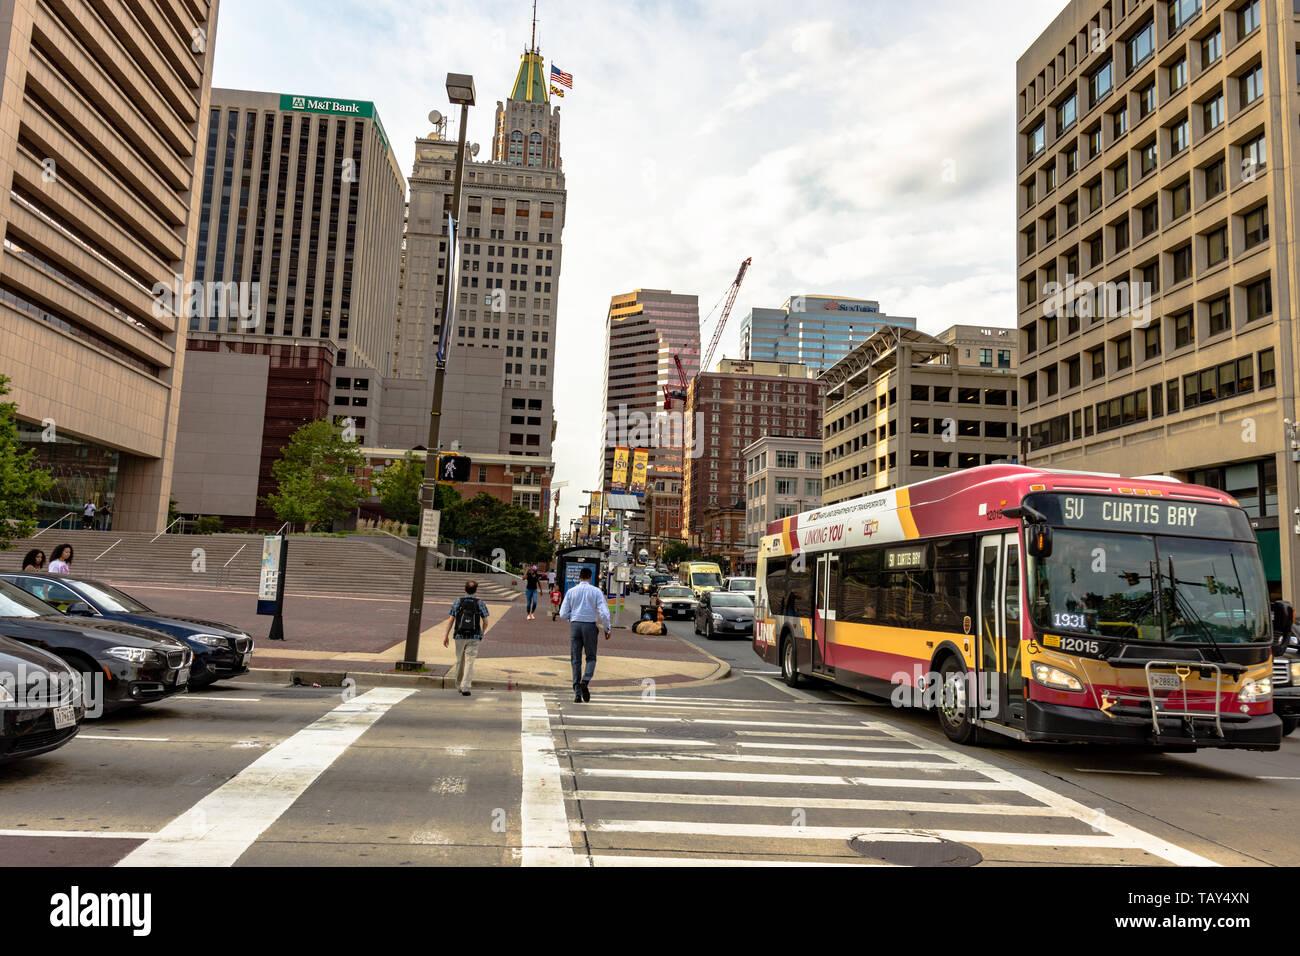 Baltimore, Maryland, USA - July 11, 2017: Traffic and